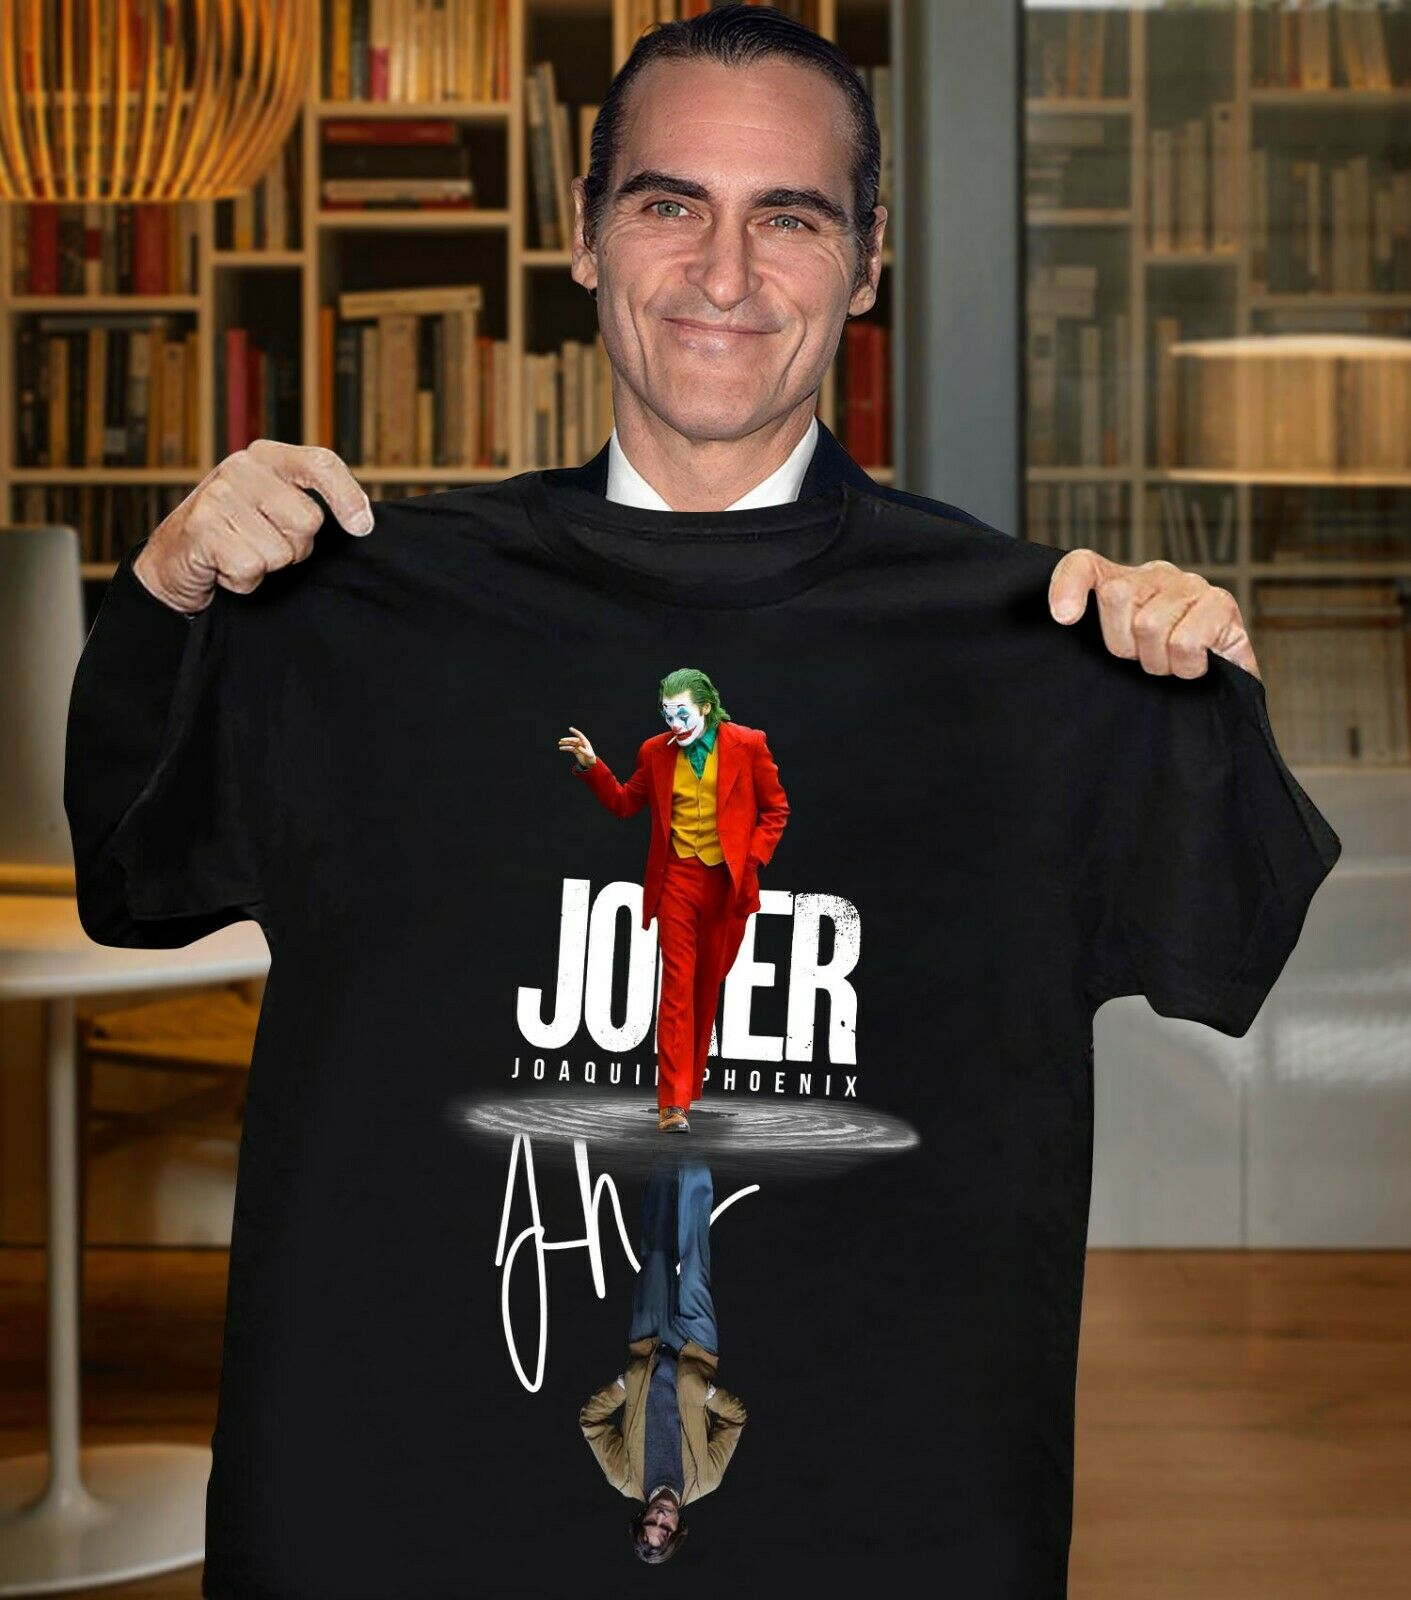 Joker Reflection Joaquin Phoenix T Shirt Signature